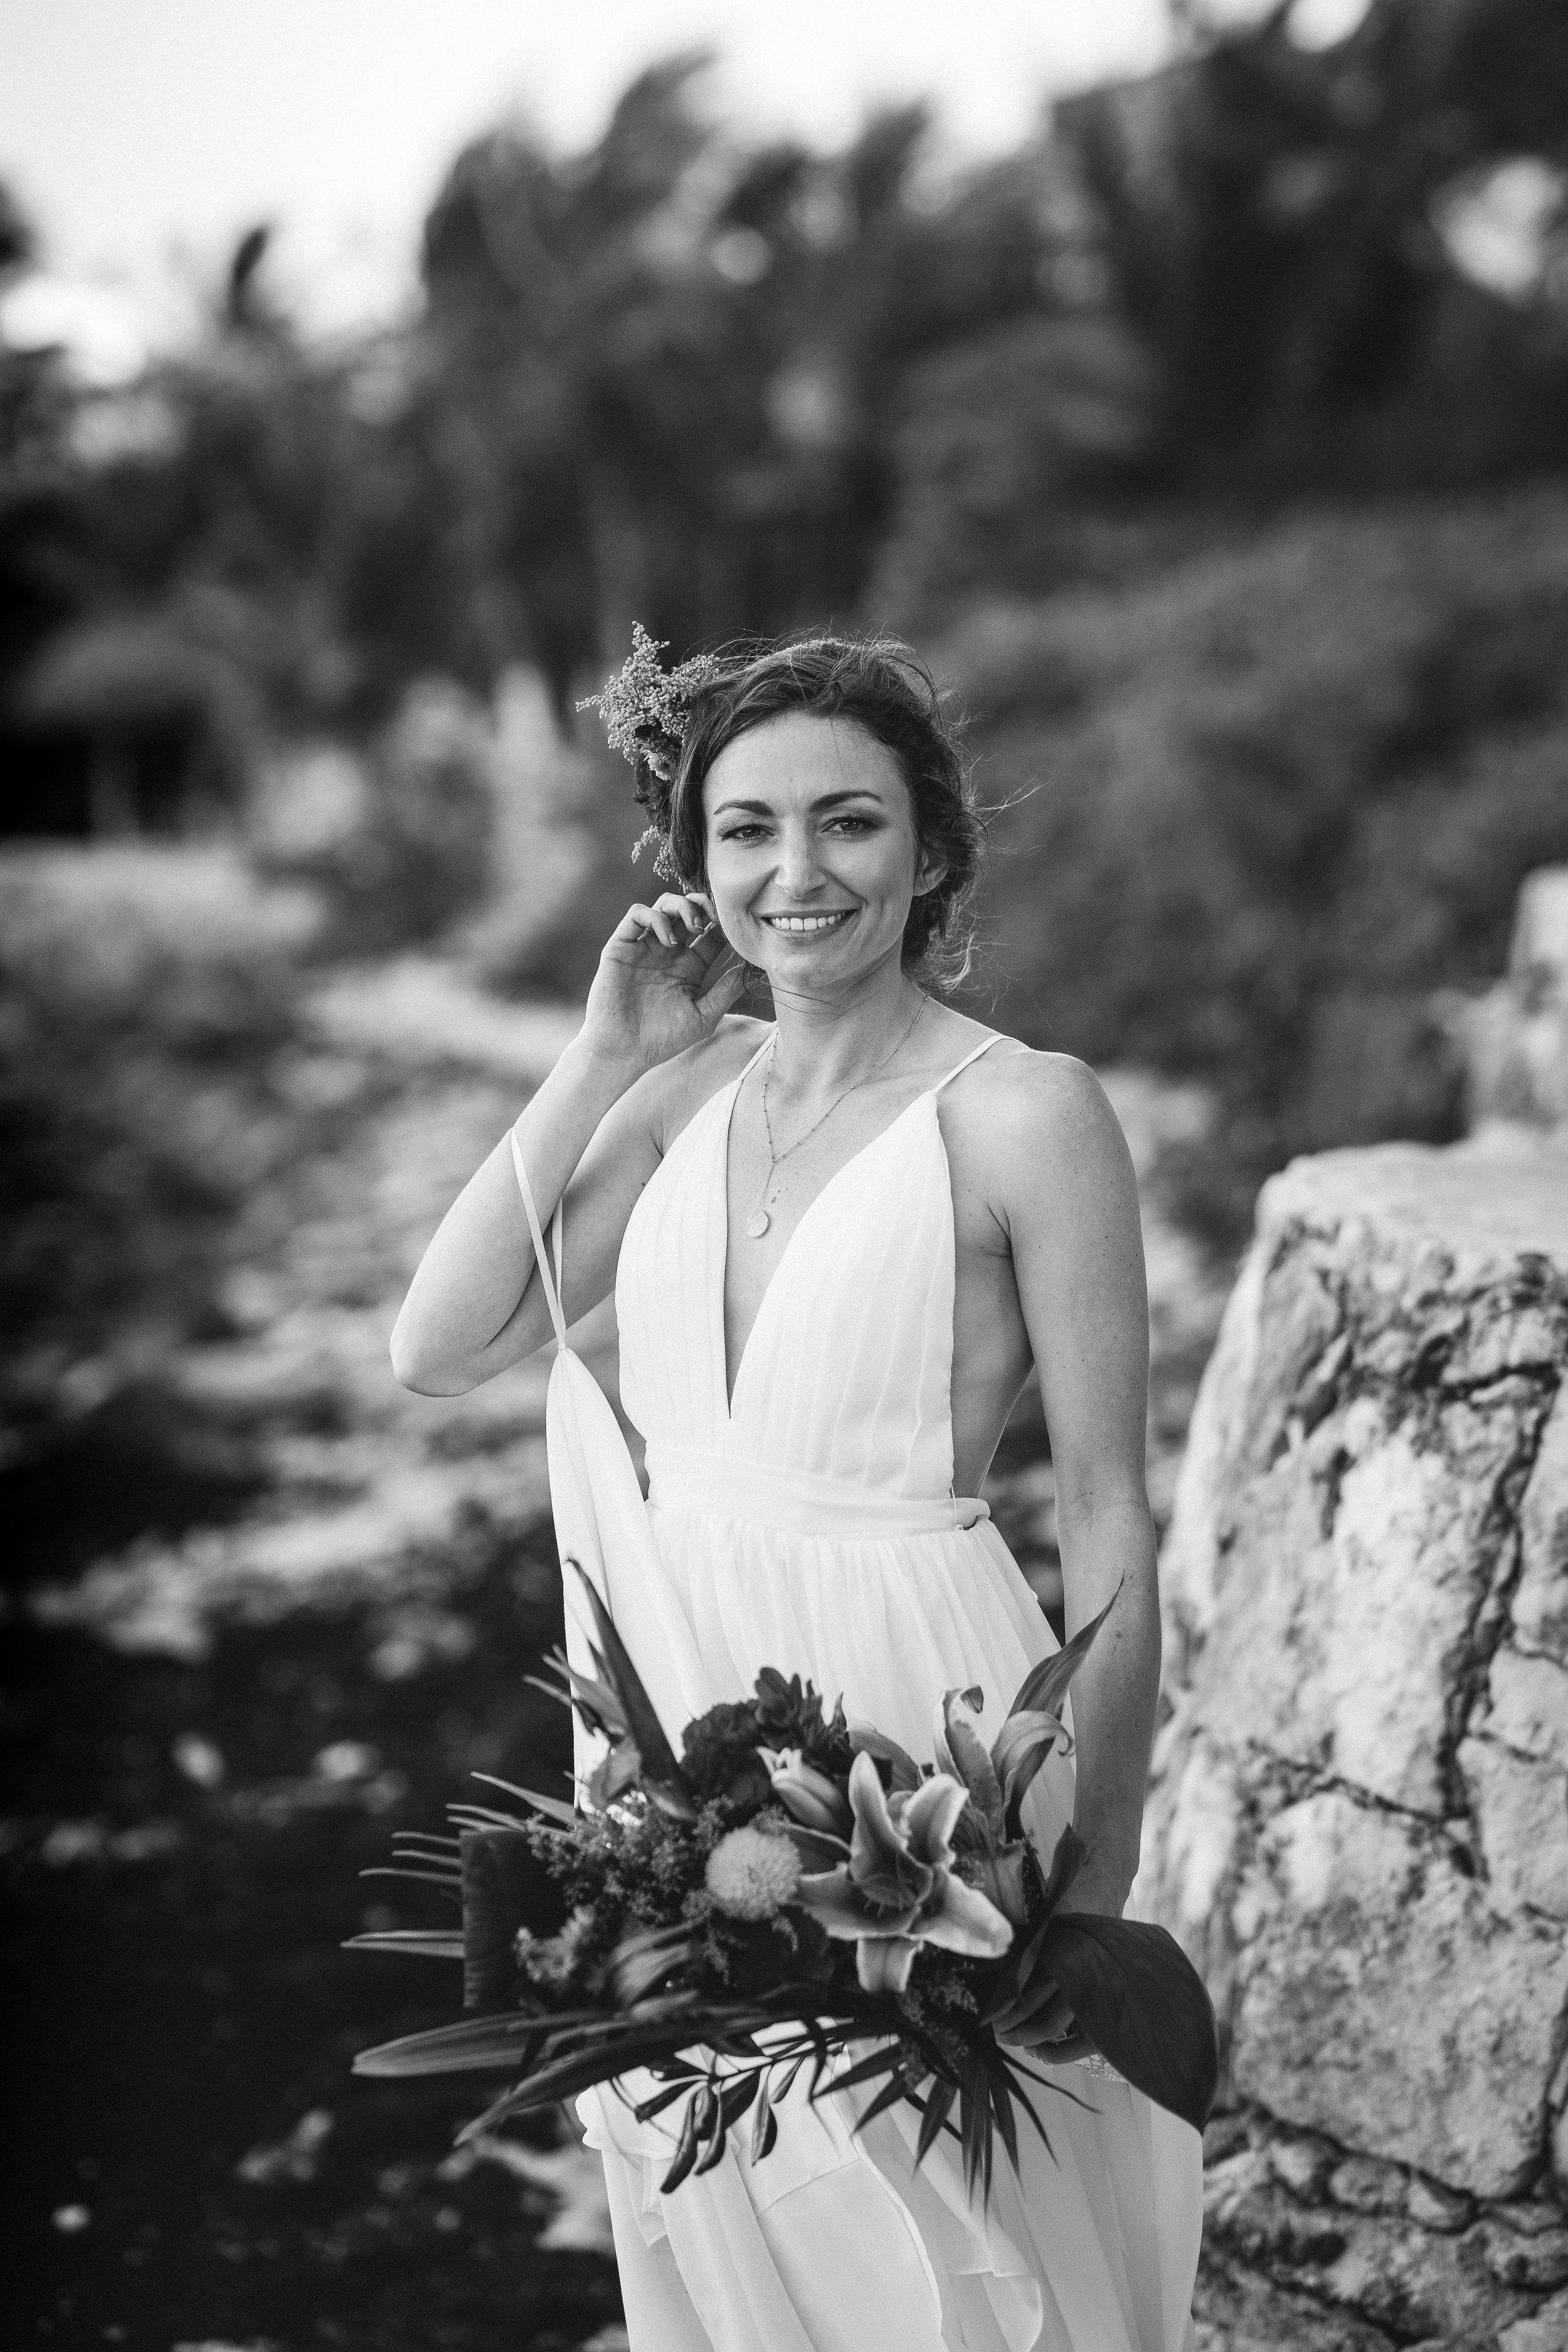 Nicole-Daacke-Photography-beachfront-akumal-destionation-wedding-tulum-mexico-elopement-photographer-destination-wedding-inspiration-sunset-champagne-pop-boho-bride-ocean-tropical-bohemian-tulum-wedding-photos-176.jpg